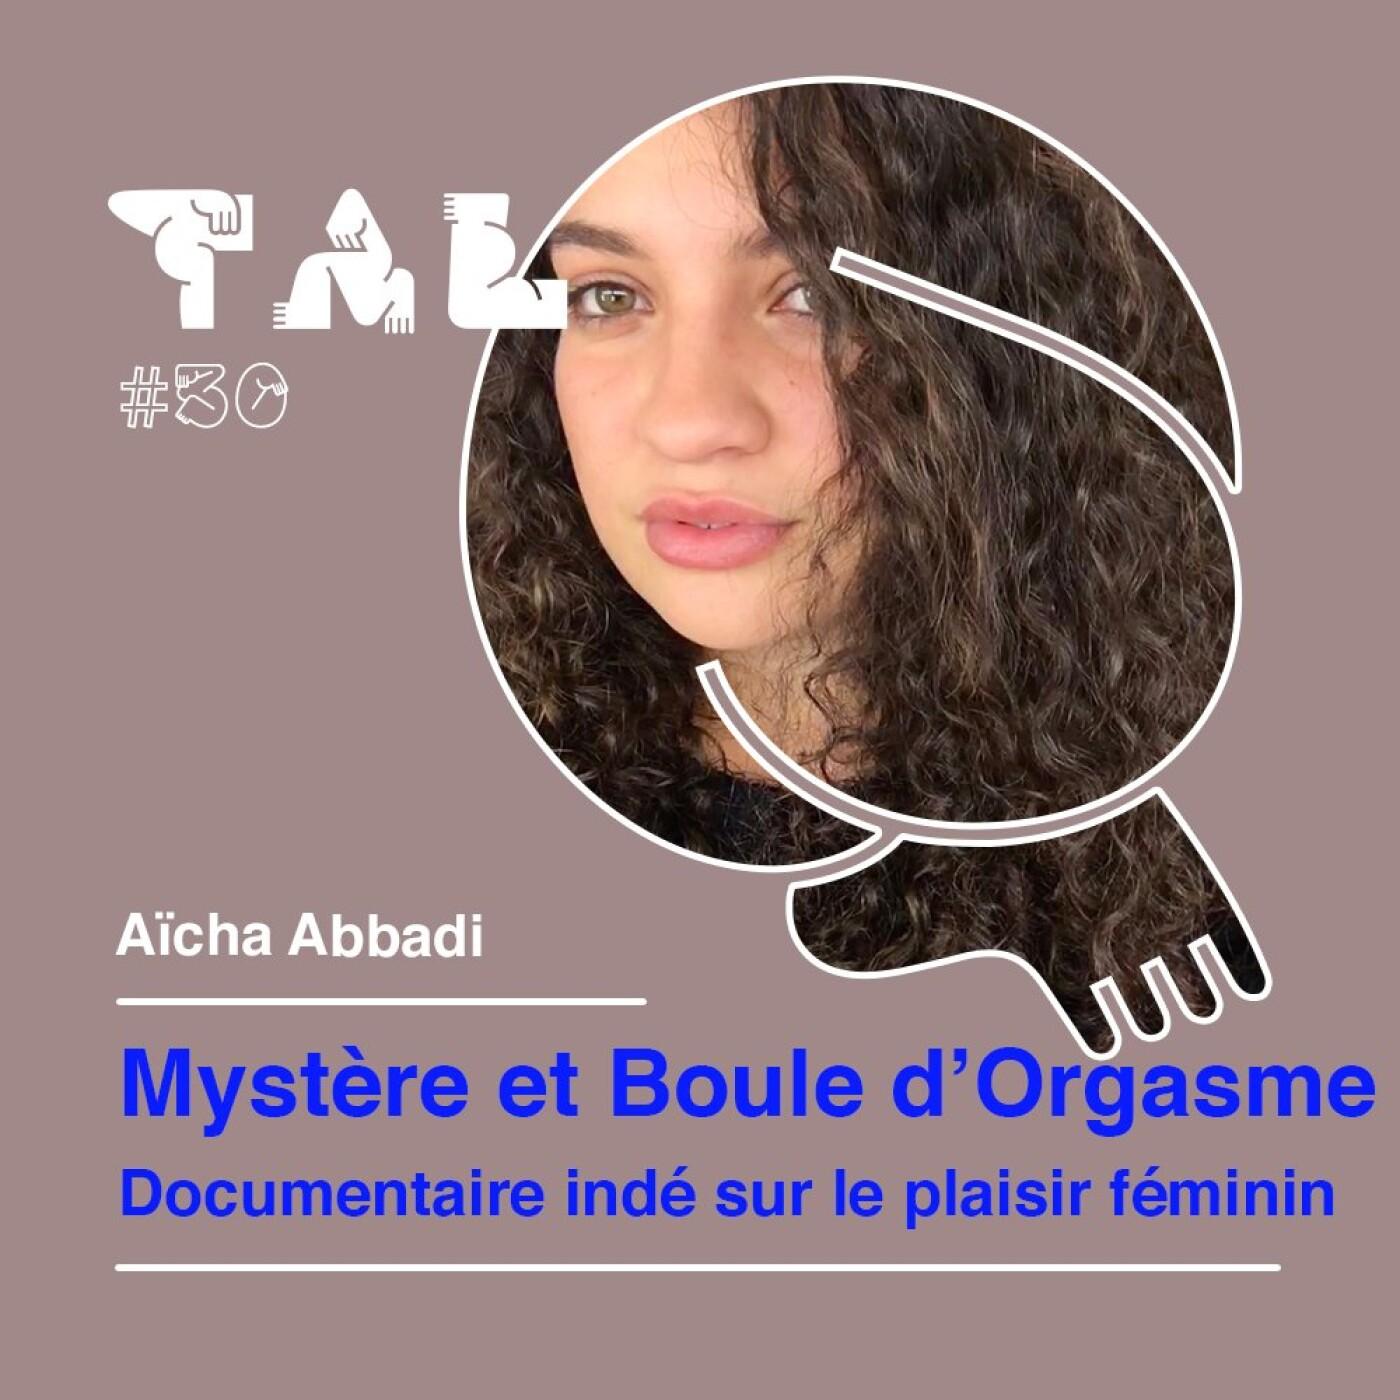 #30 - Aïcha Abbadi - Mystère et Boule d'Orgasme